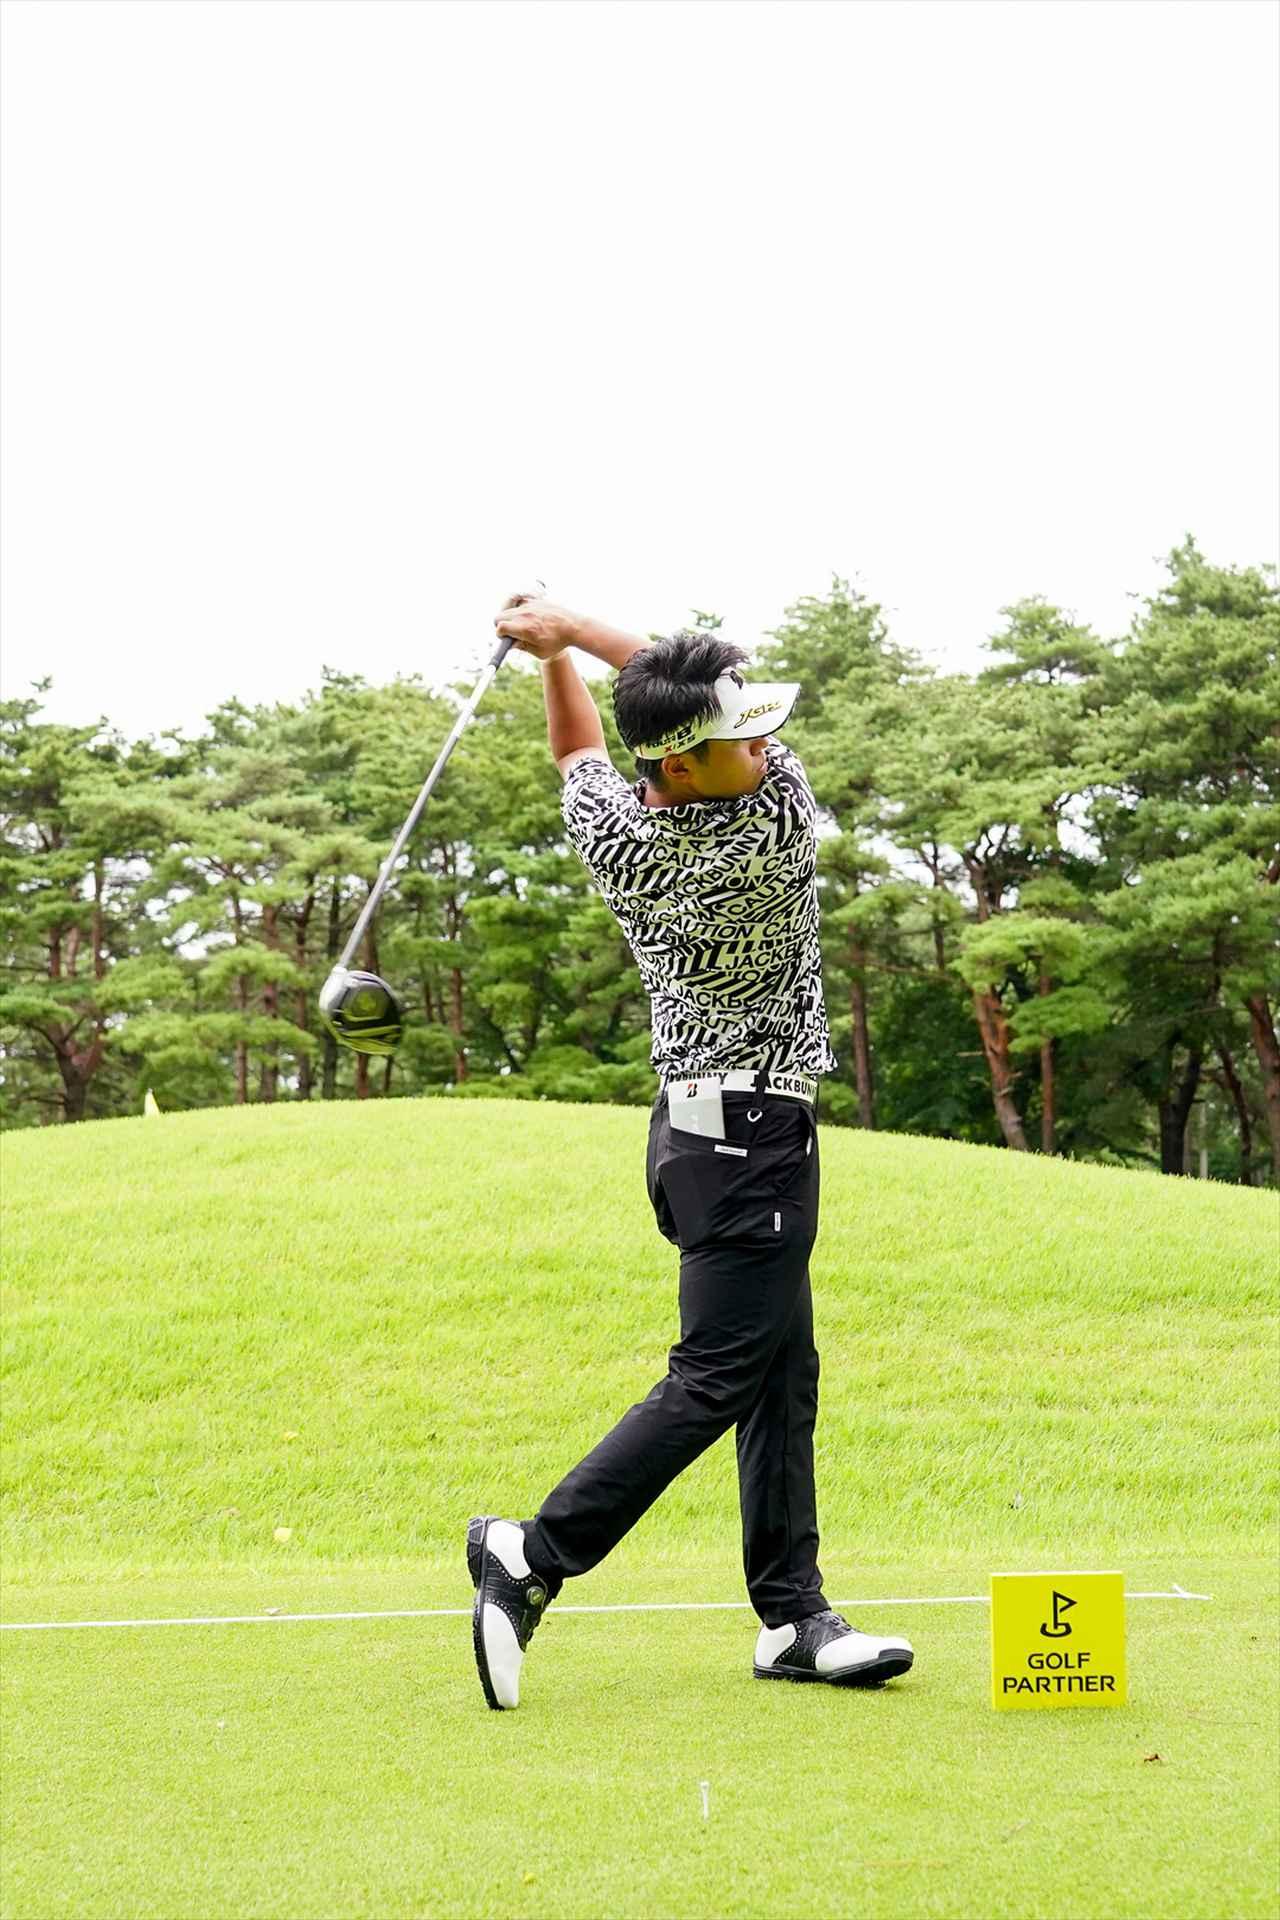 Images : 12番目の画像 - 関藤直煕 ドライバー正面連続写真 - みんなのゴルフダイジェスト